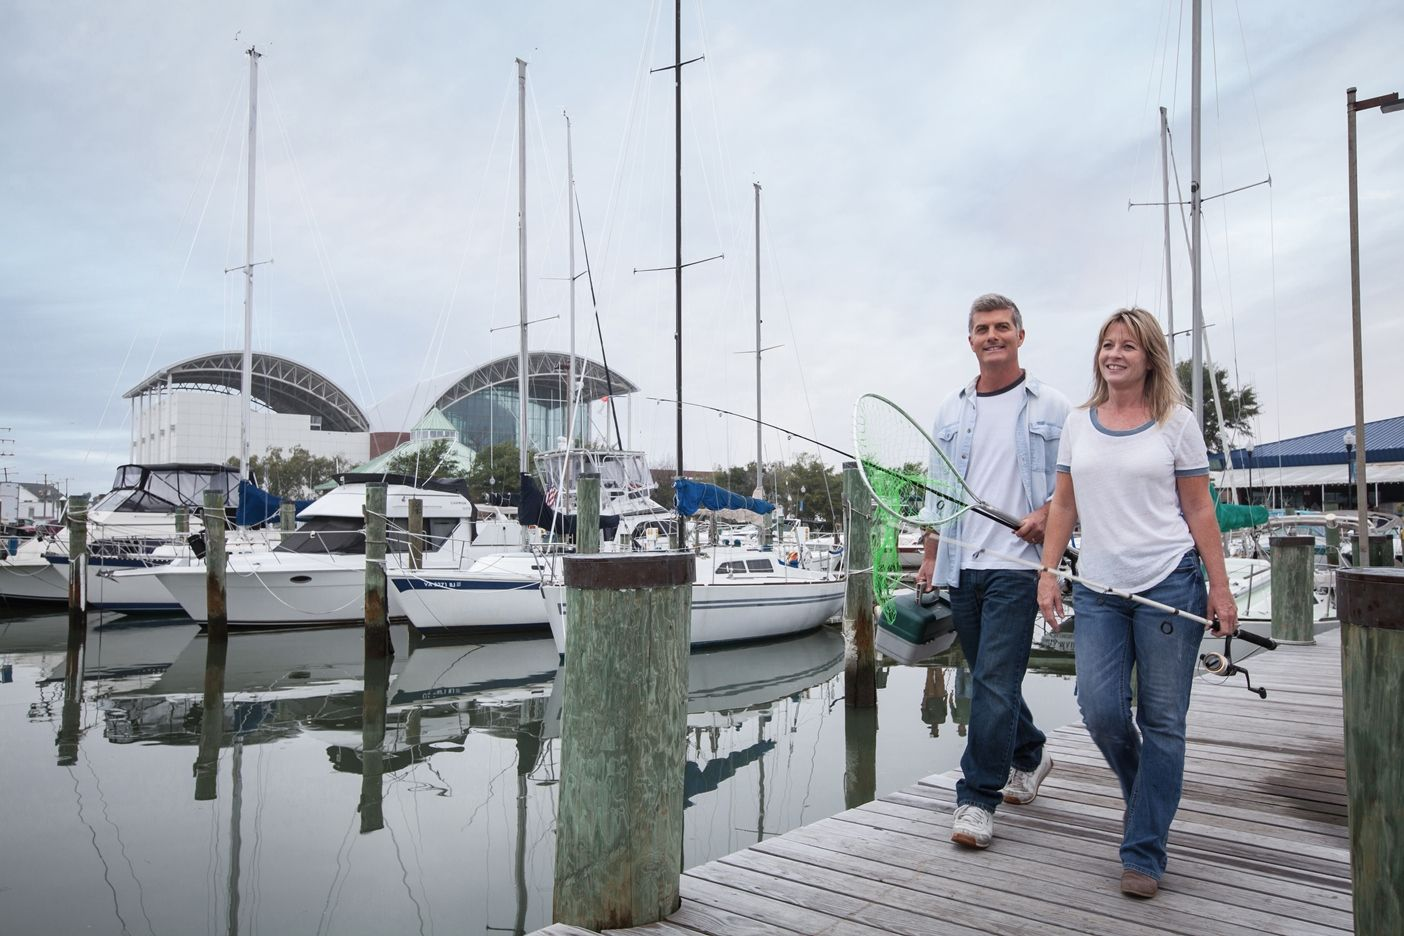 Downtown hampton marina hampton va pinterest for Buckroe beach fishing pier